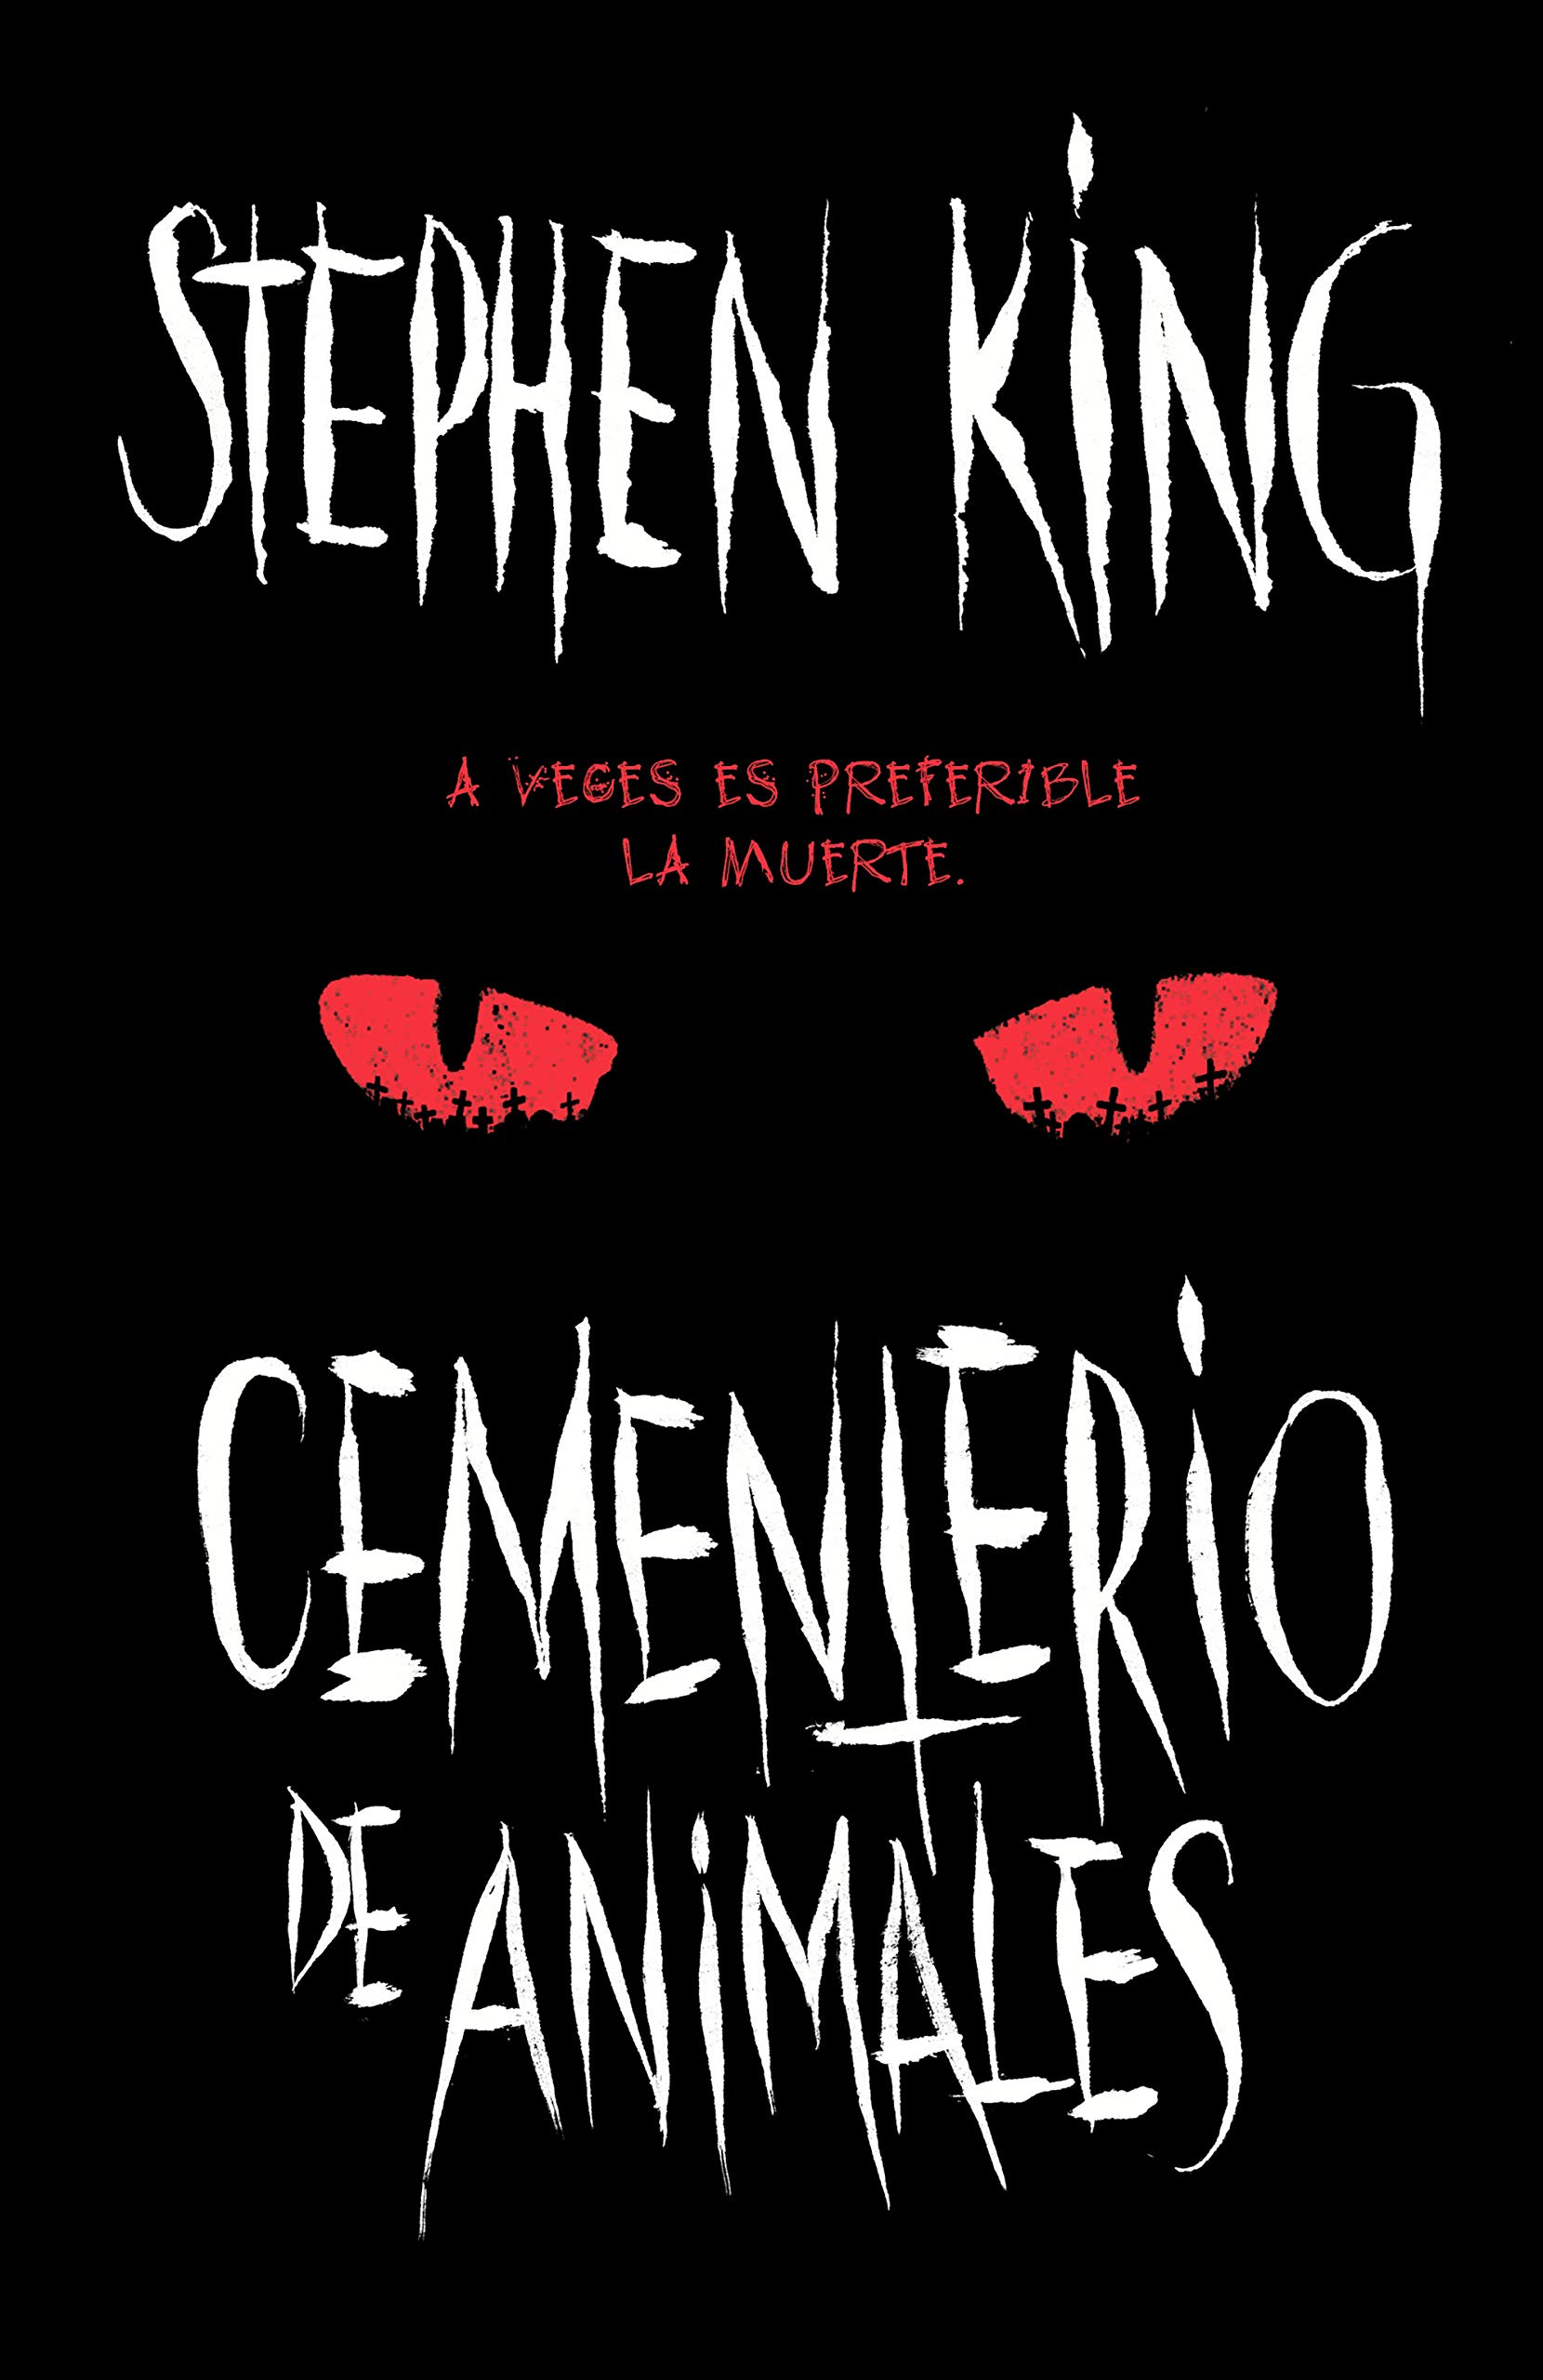 Cementerio de animales (Best Seller): Amazon.es: King, Stephen ...